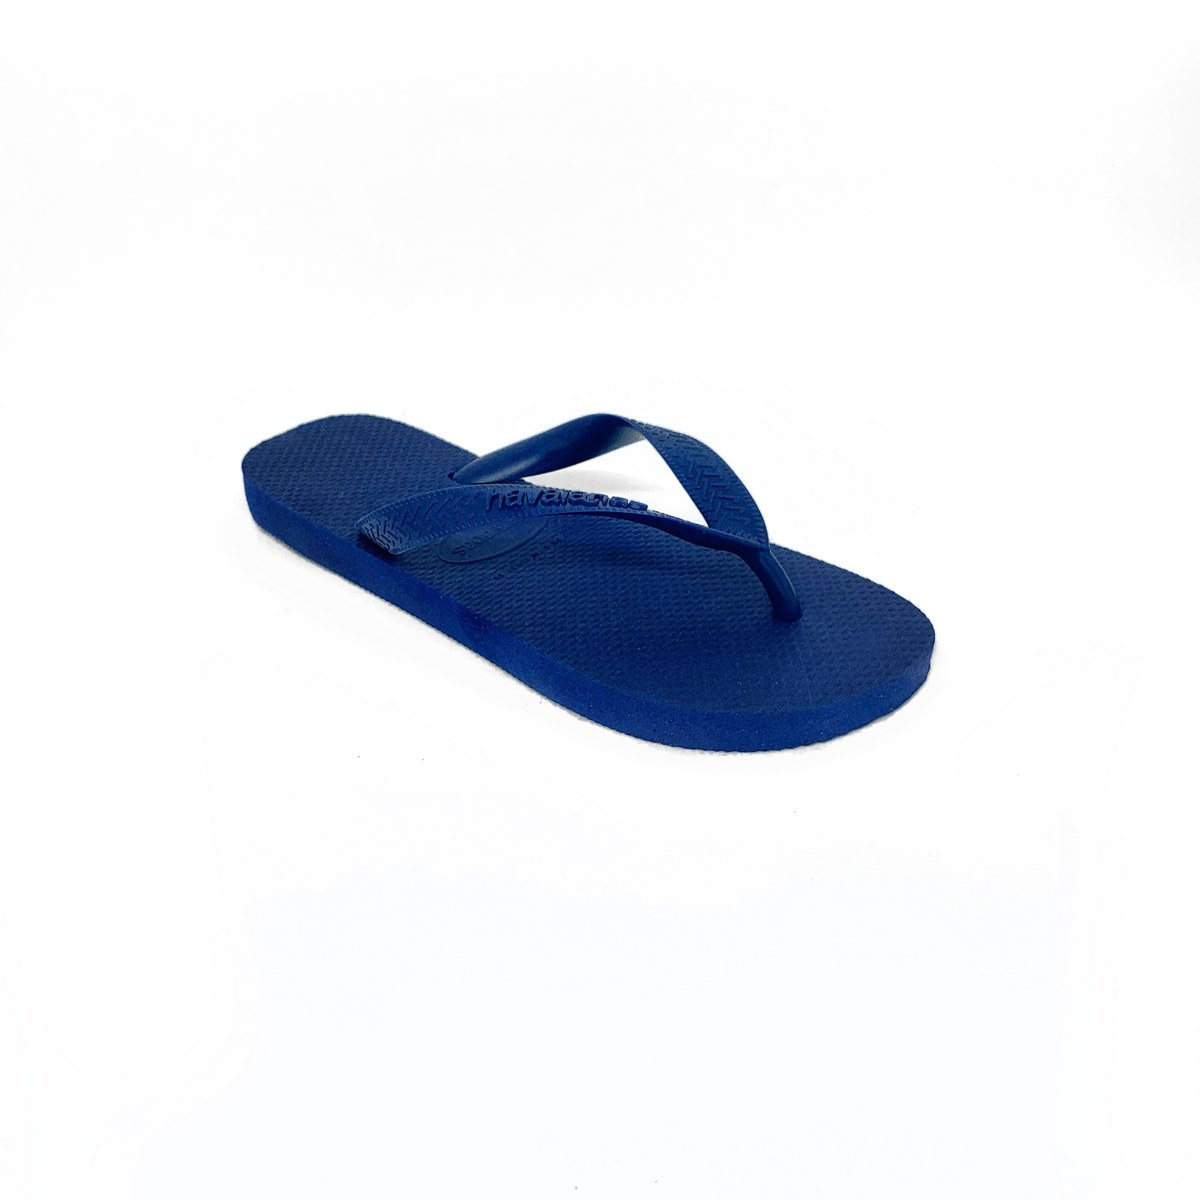 Havainas Top Azul Marinho